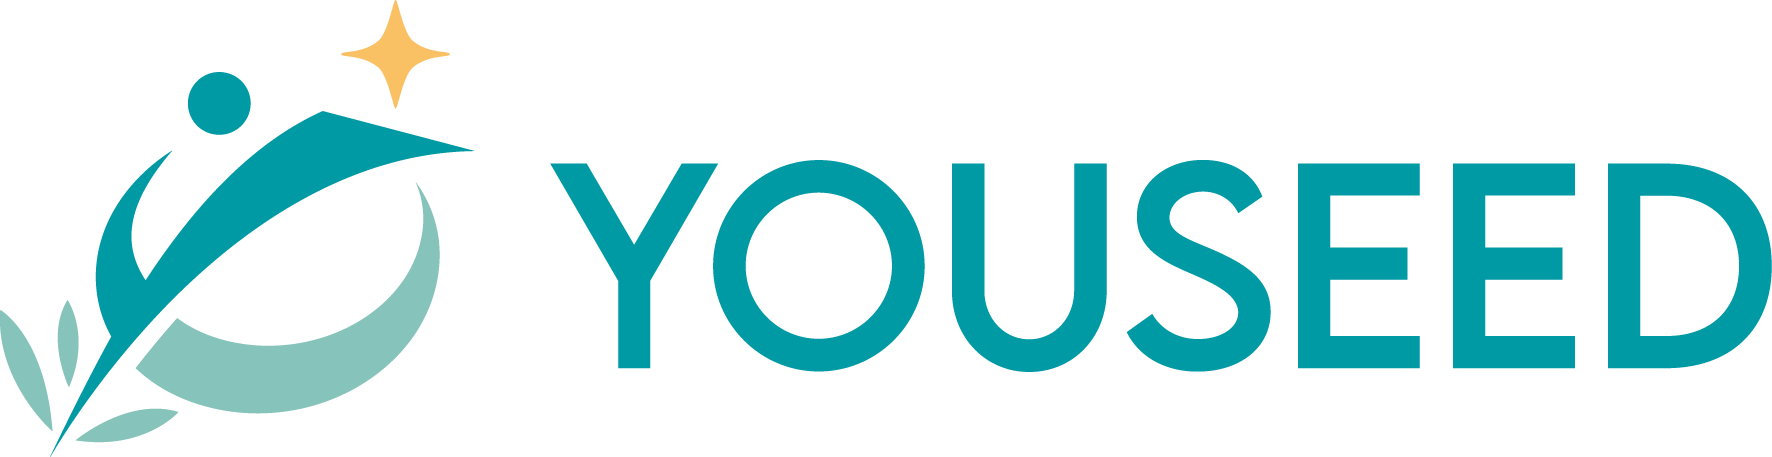 YOUSEED株式会社 公式ページ